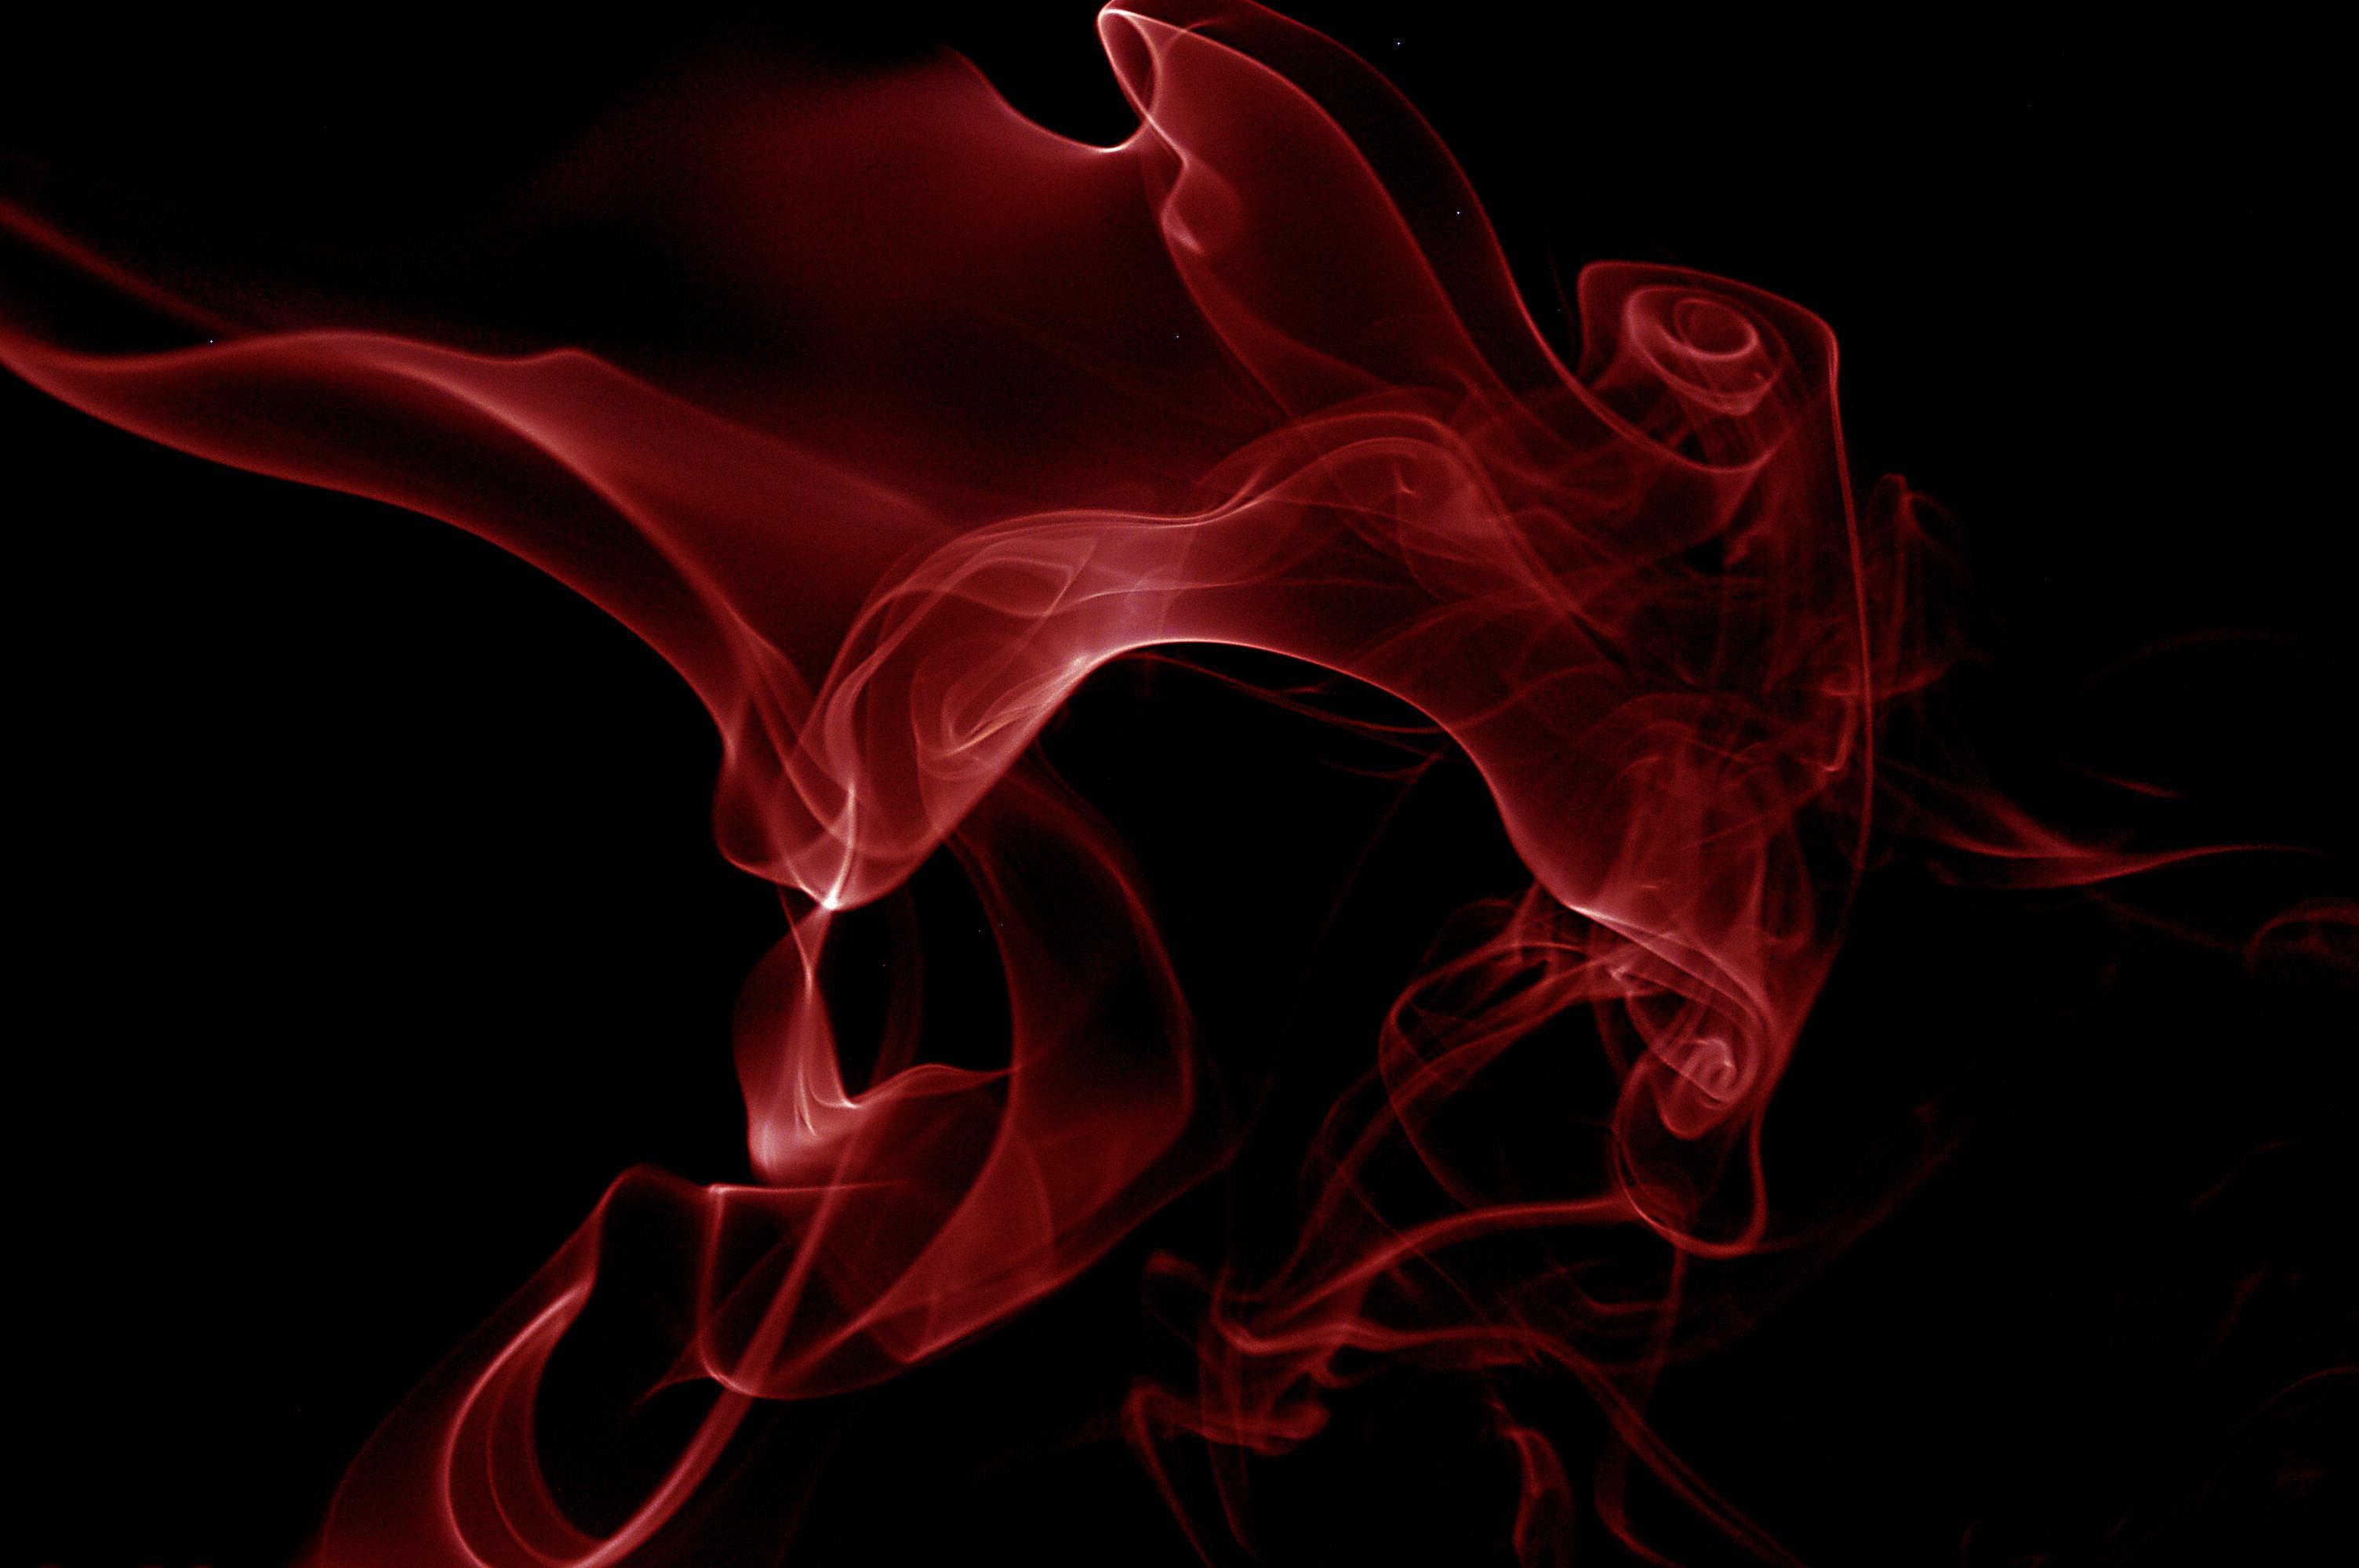 52 Animated Smoke